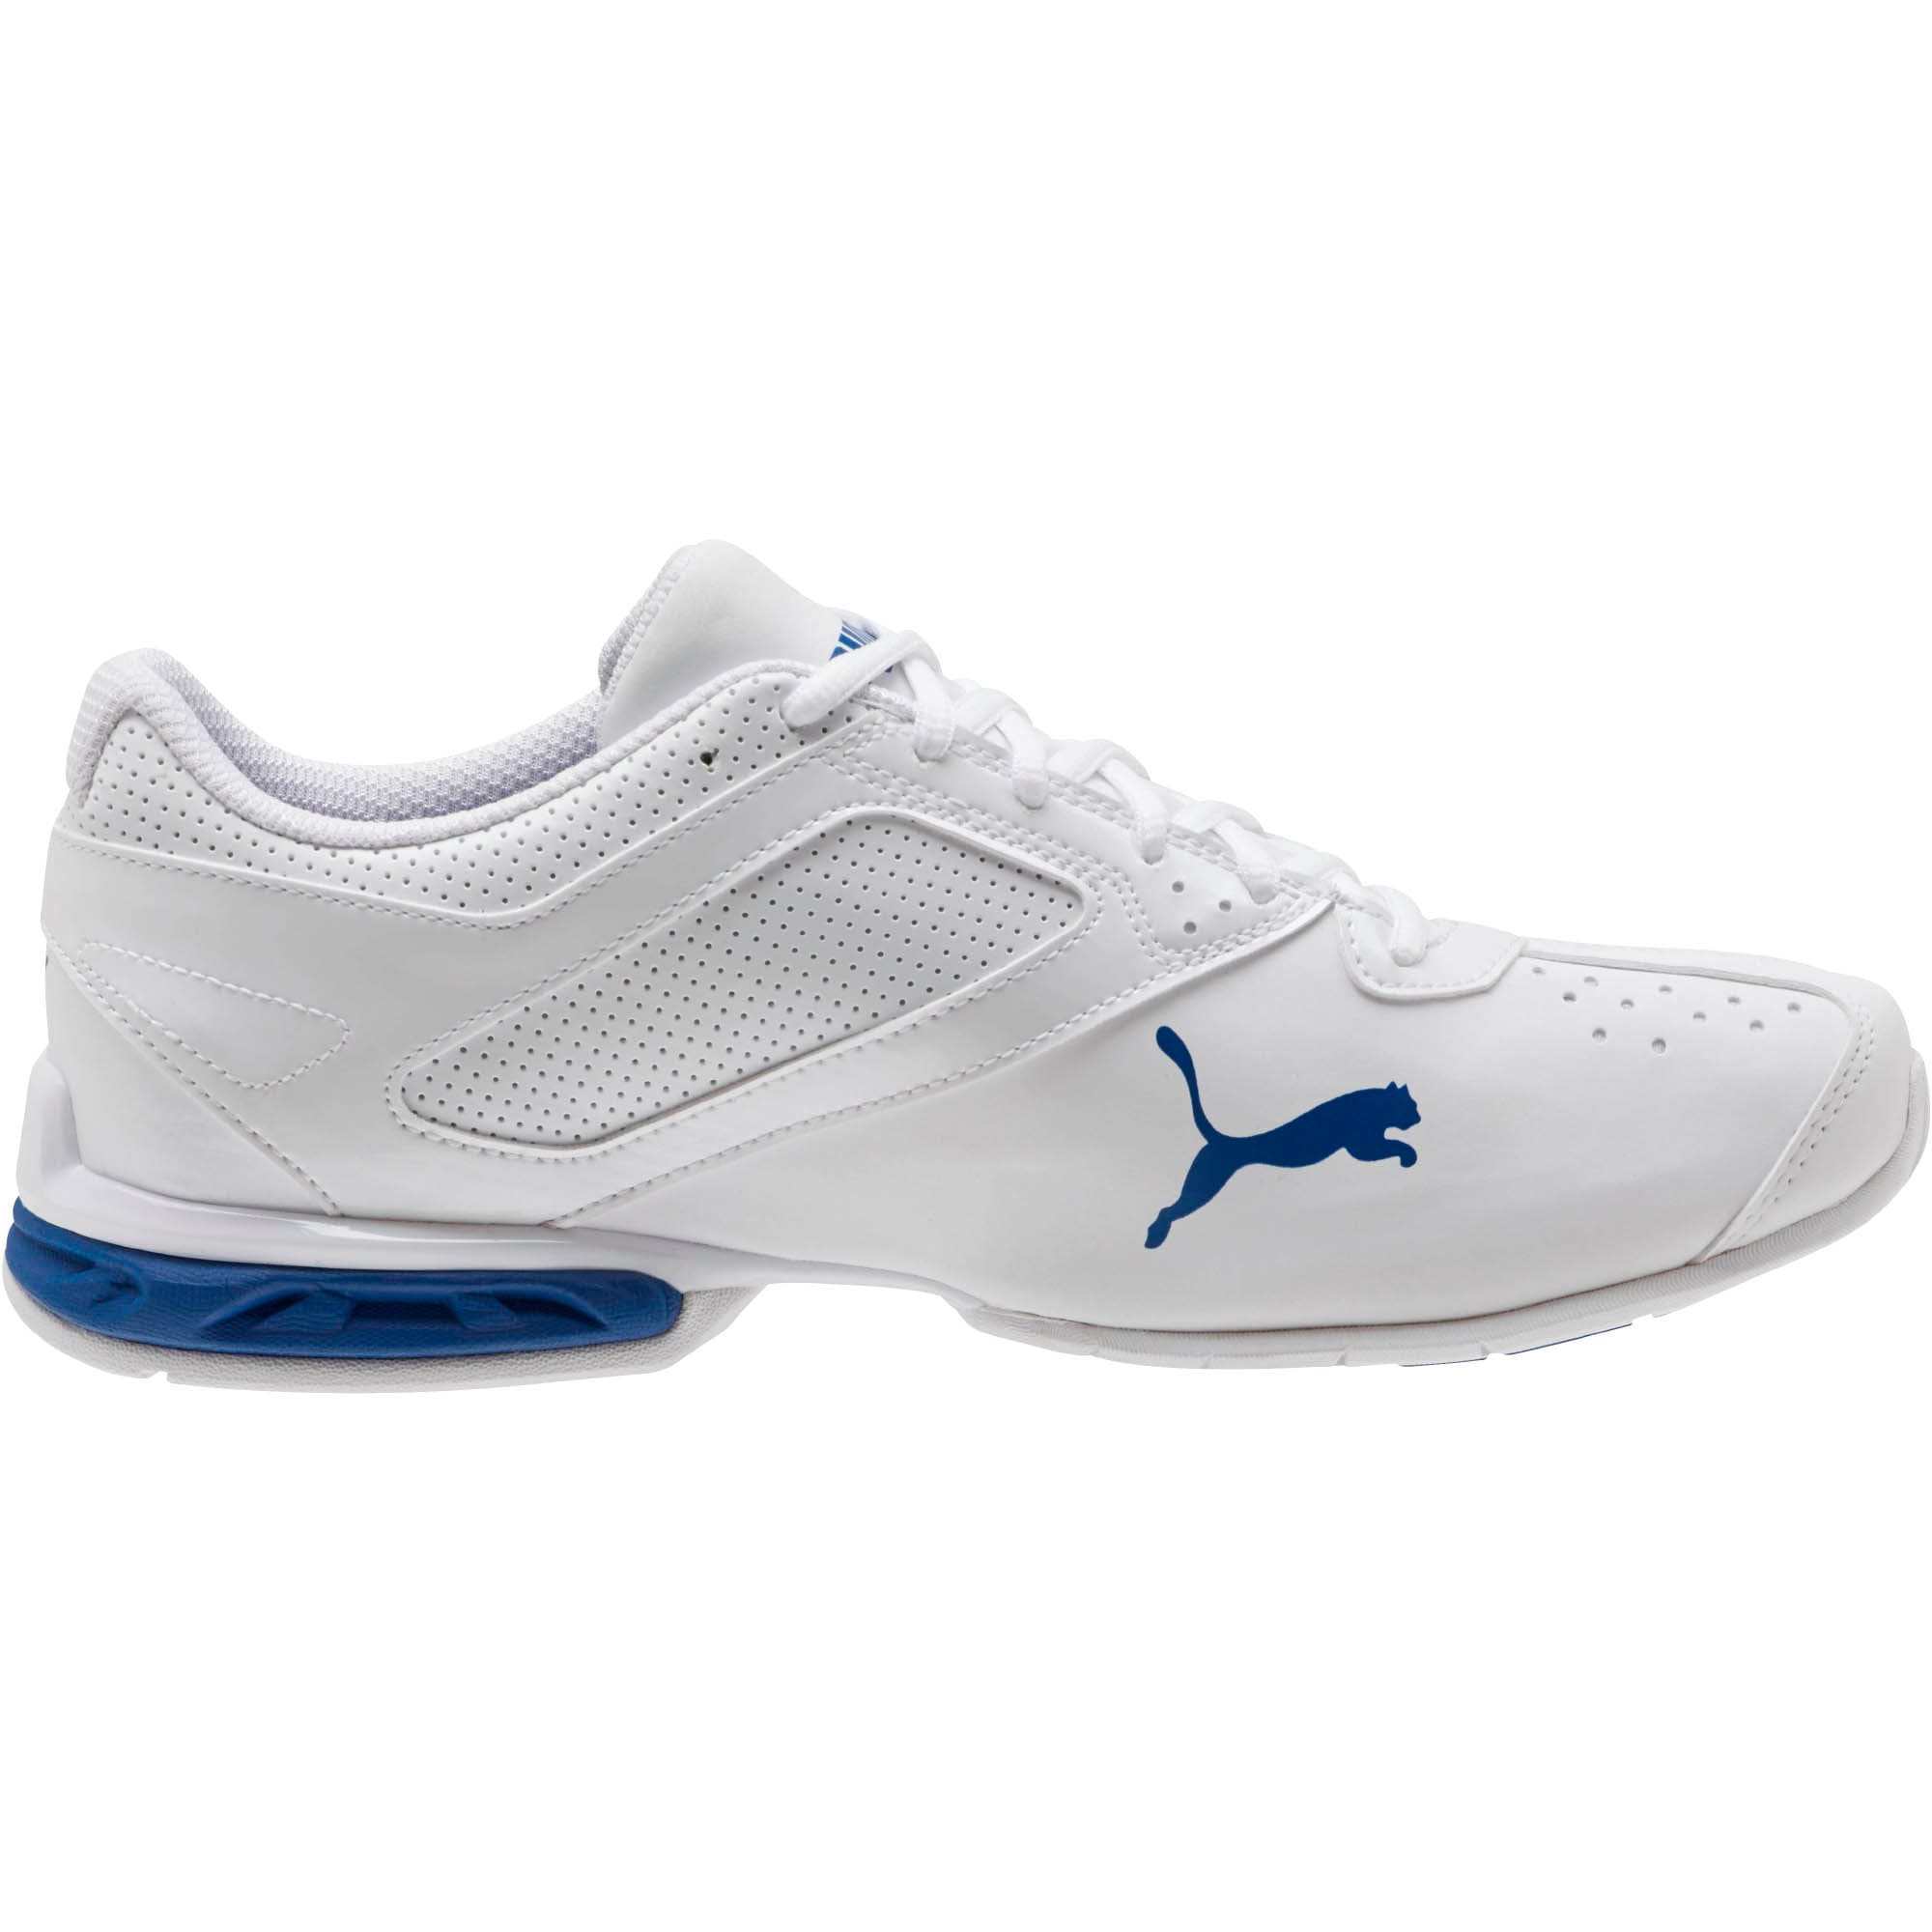 Thumbnail 4 of Tazon 6 FM Men's Sneakers, P White-Glaxy Blue-H Risk Rd, medium